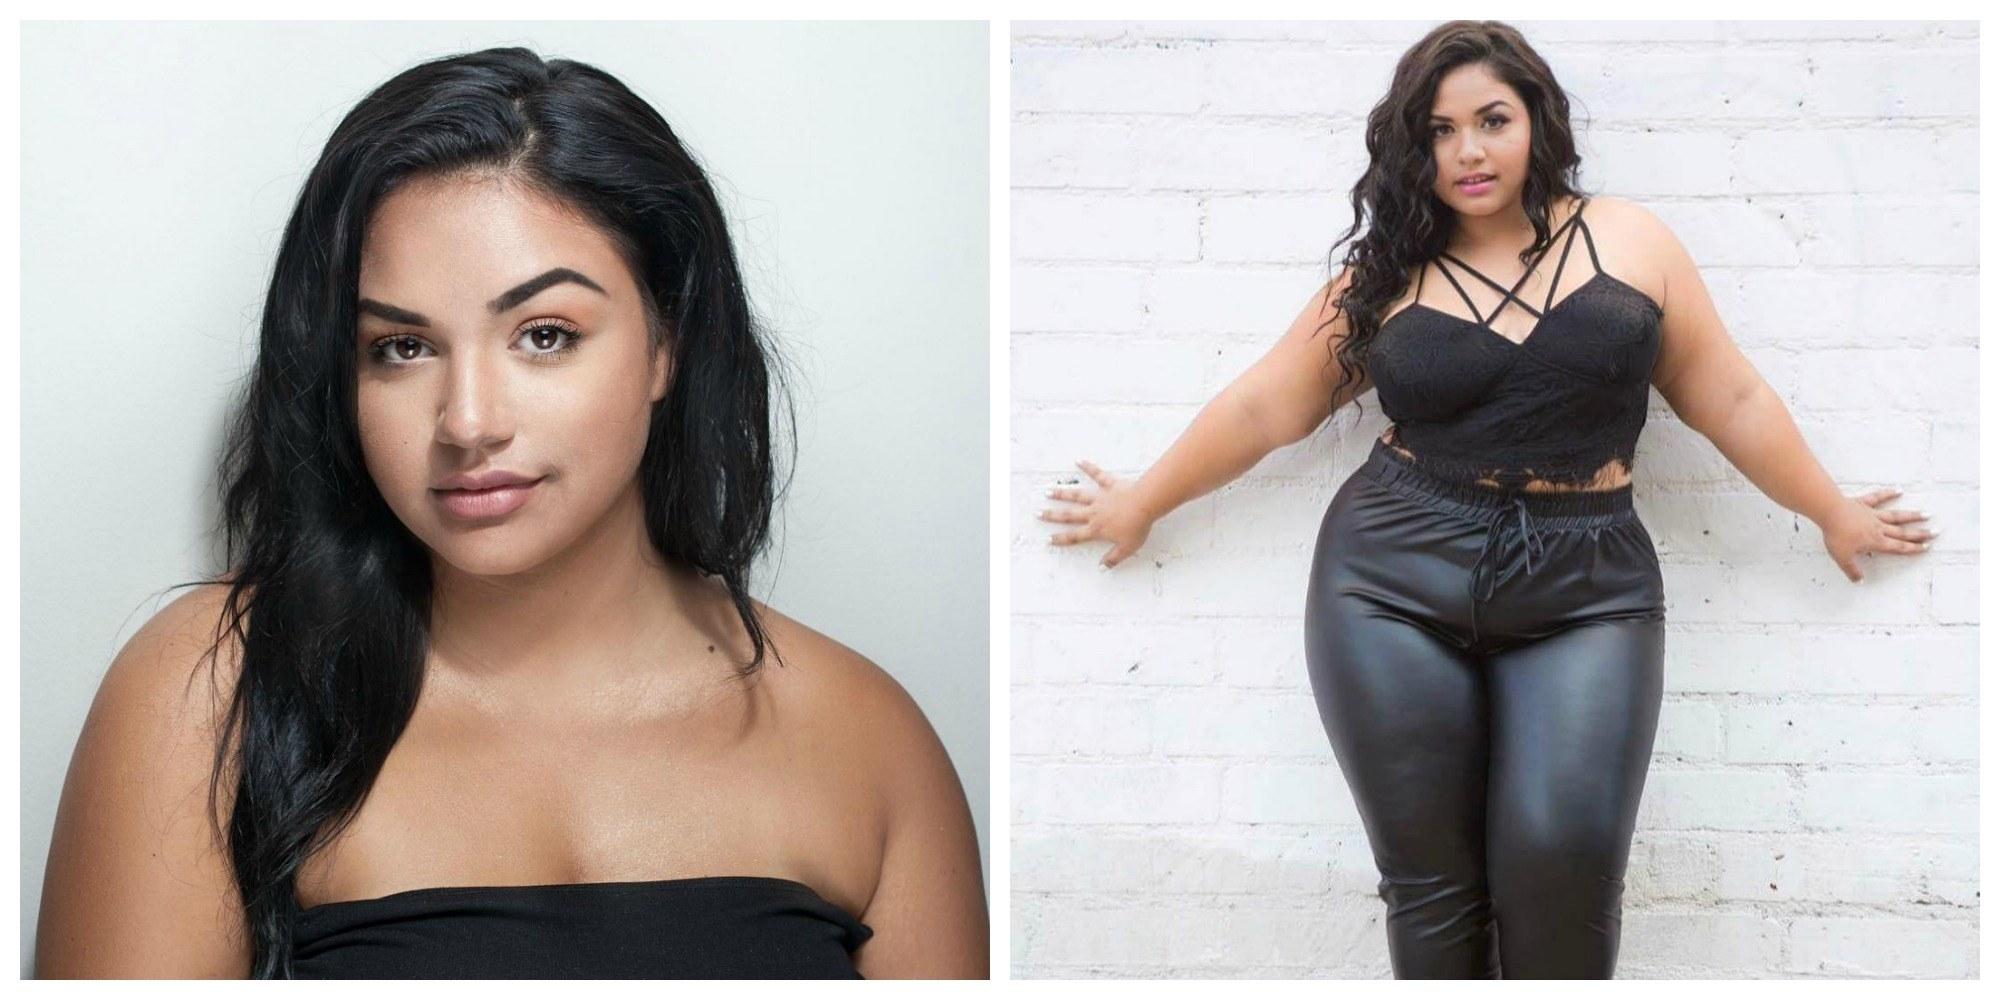 Modelo de tallas grandes posa como Kim Kardashian